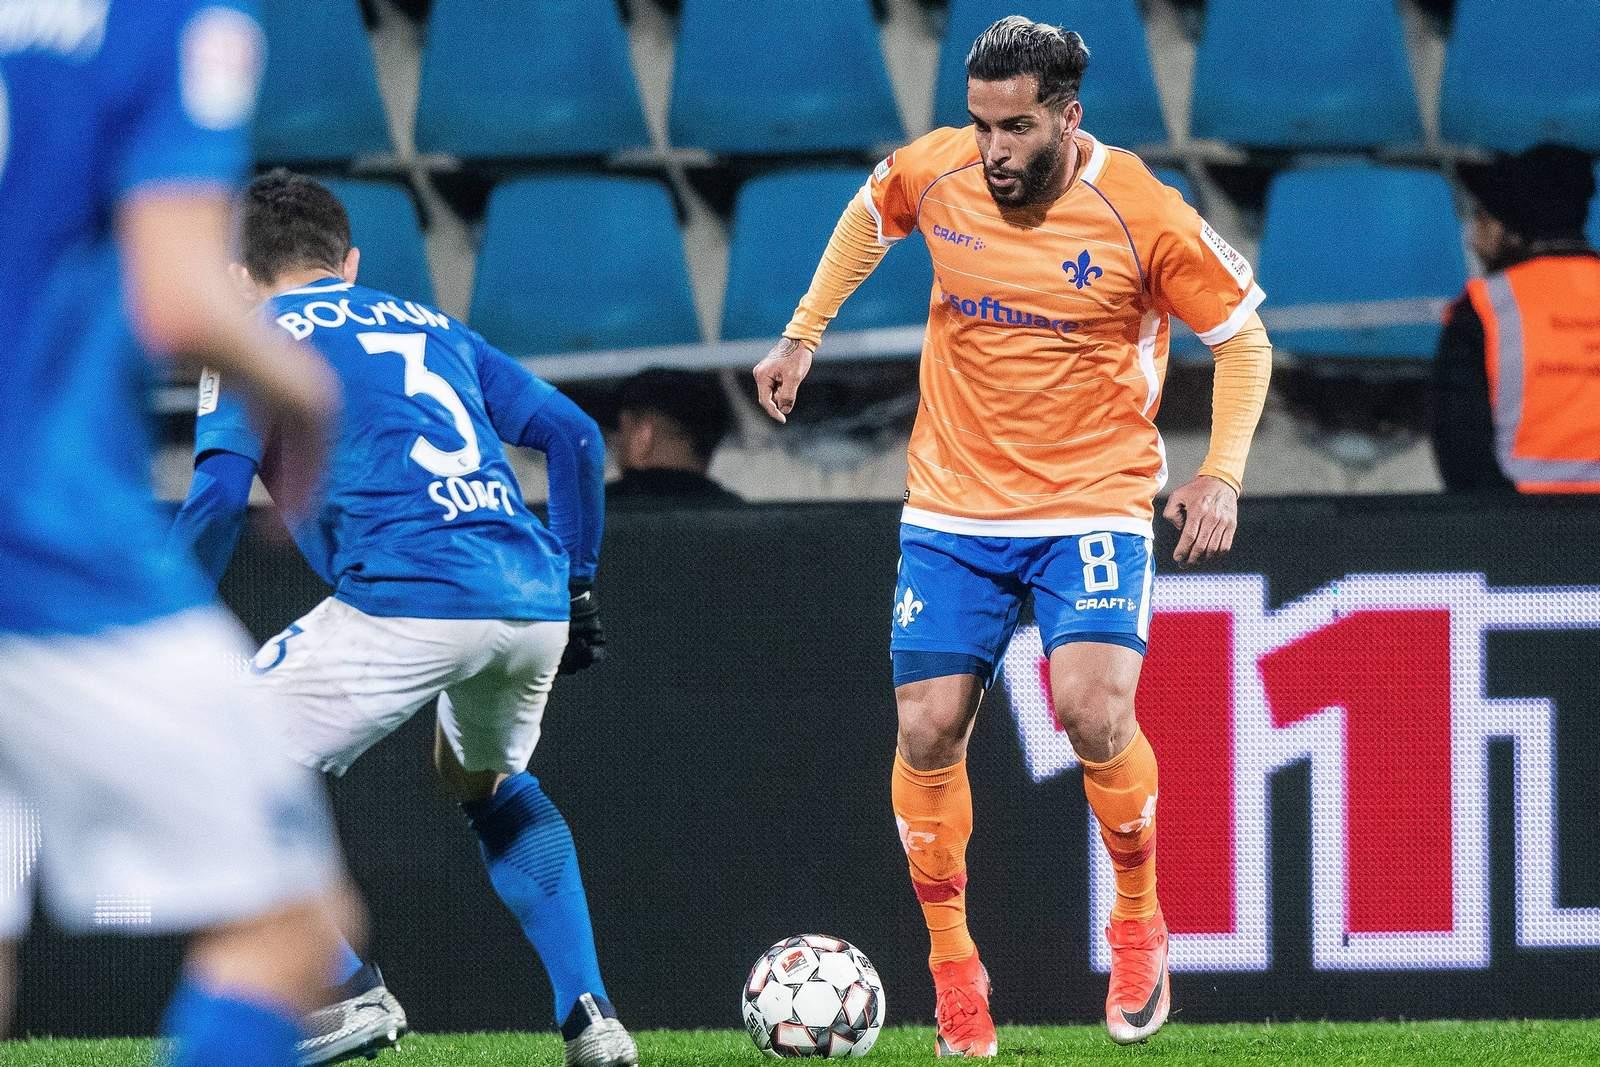 Selim Gündüz im Spiel gegen Bochum